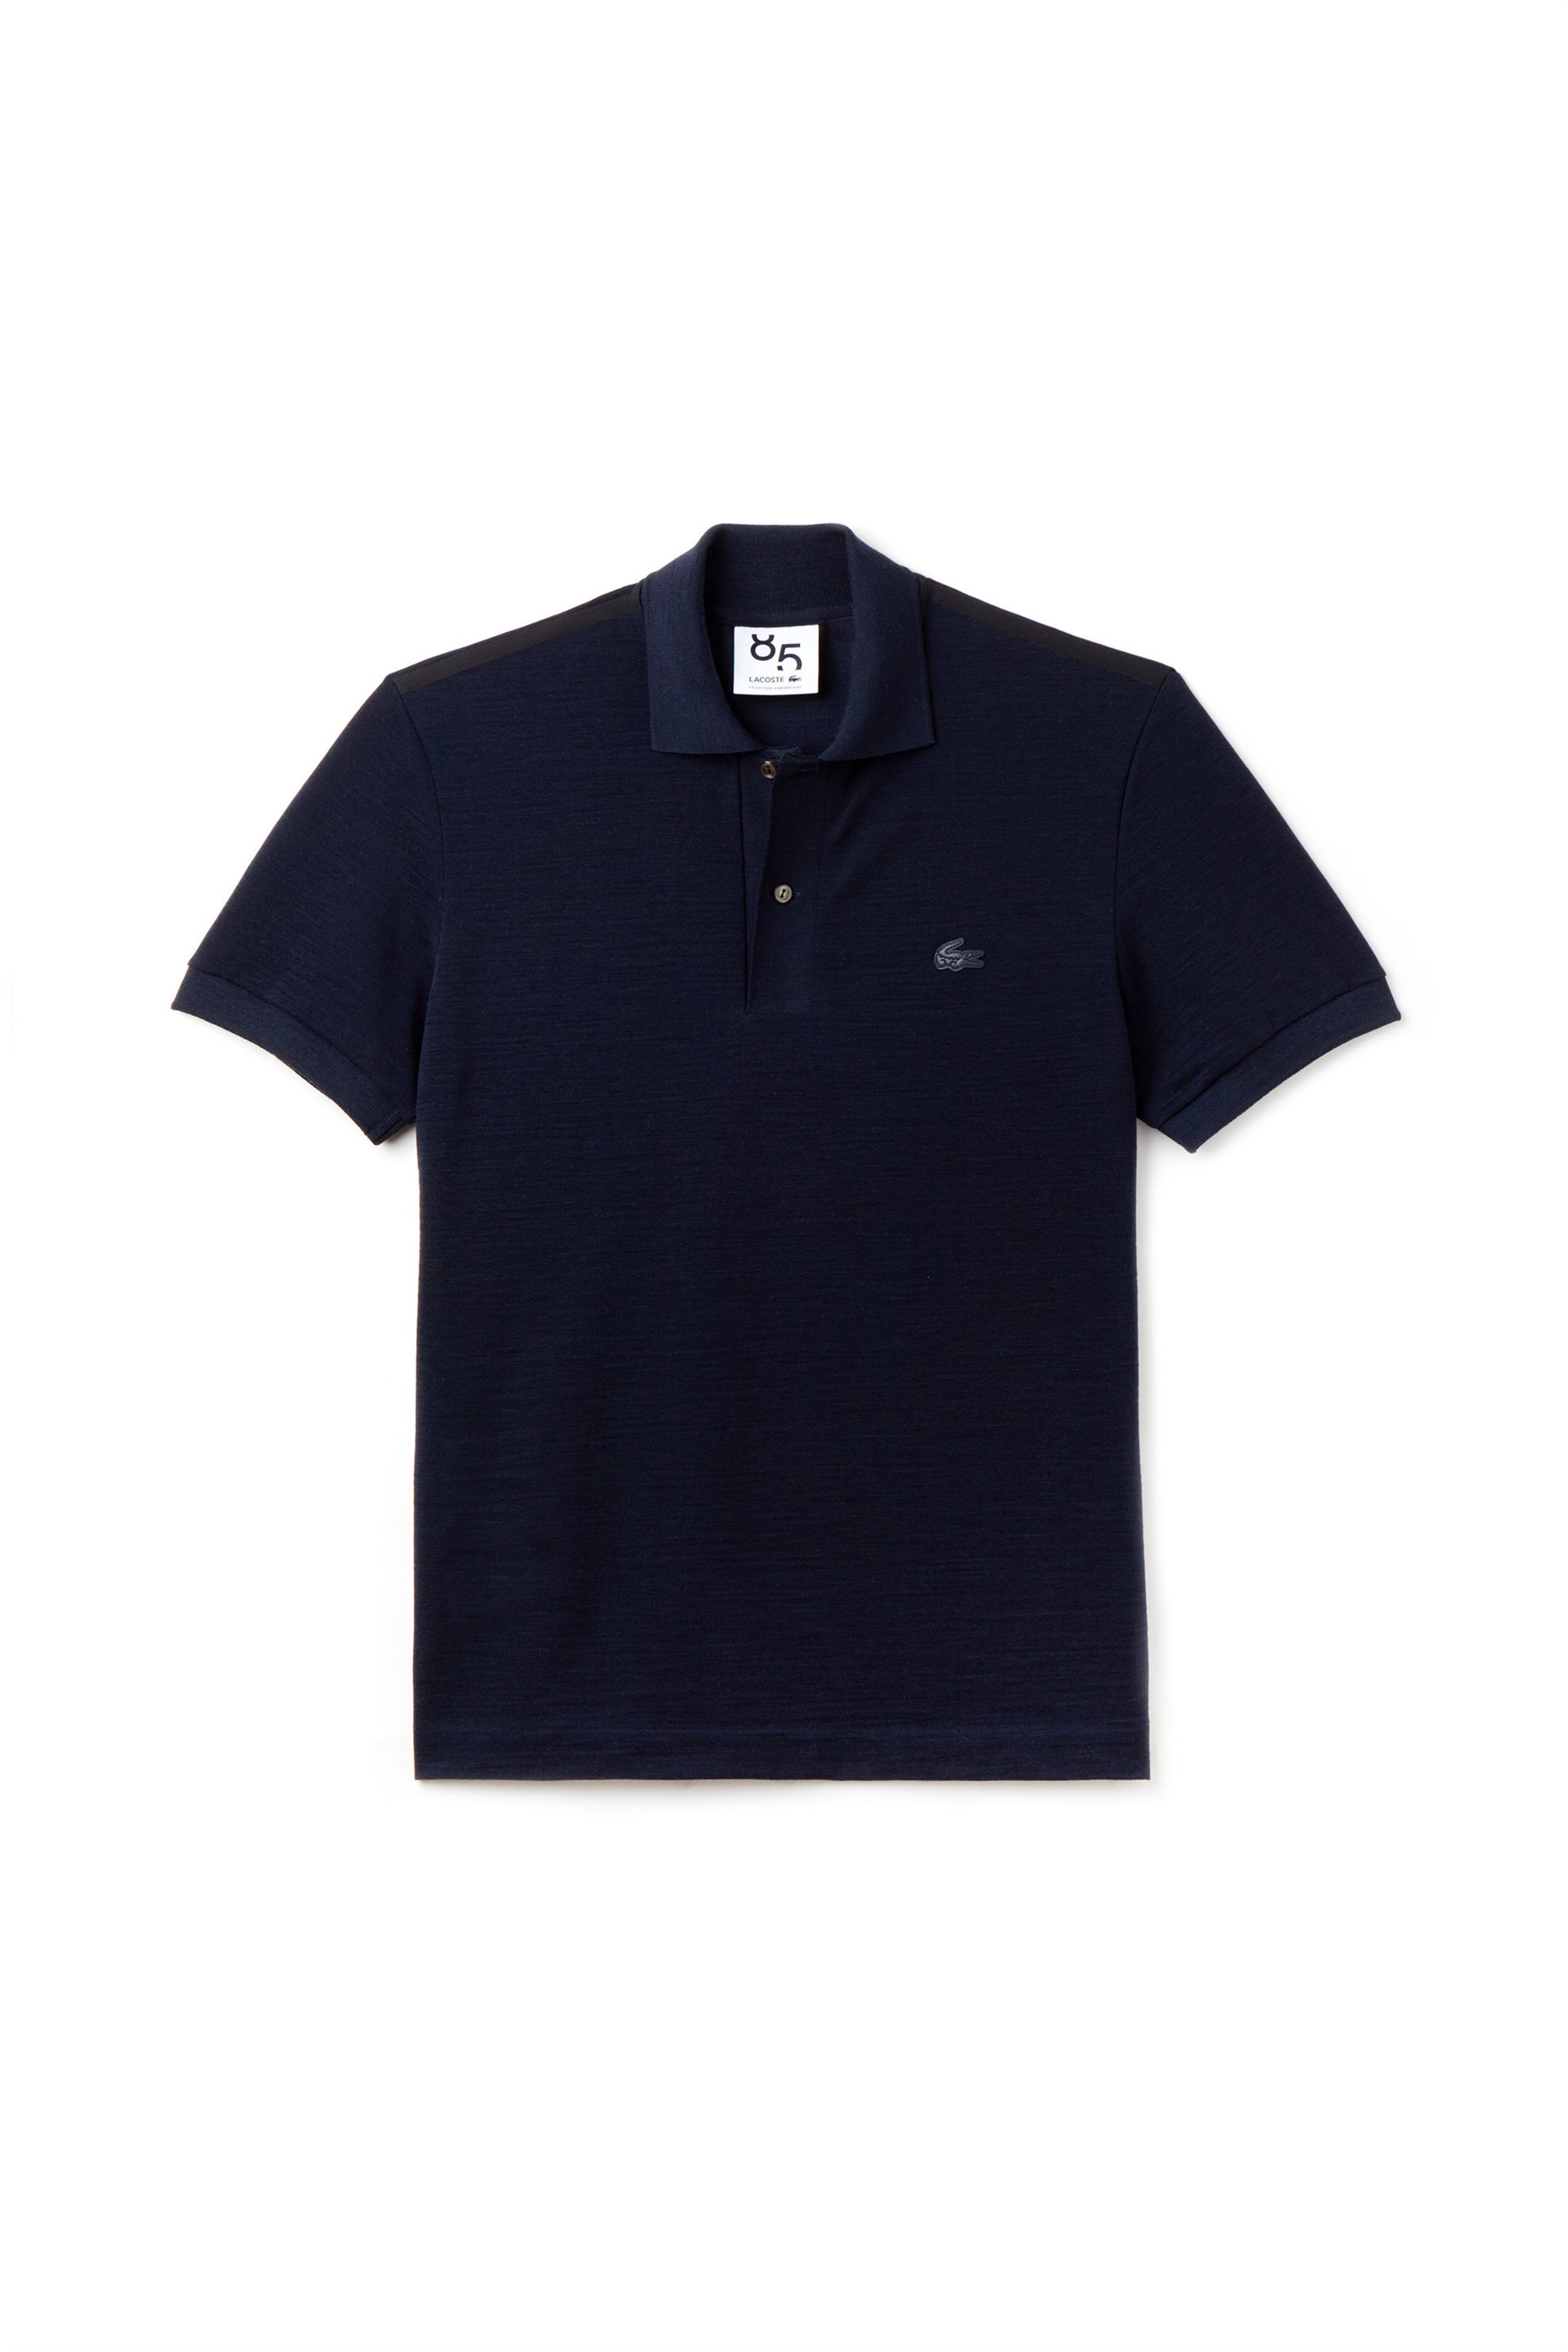 ef8d238db817 Ανδρικά   Ρούχα   Μπλούζες-   Ανδρικό T-Shirt Never Give Up (κωδ ...